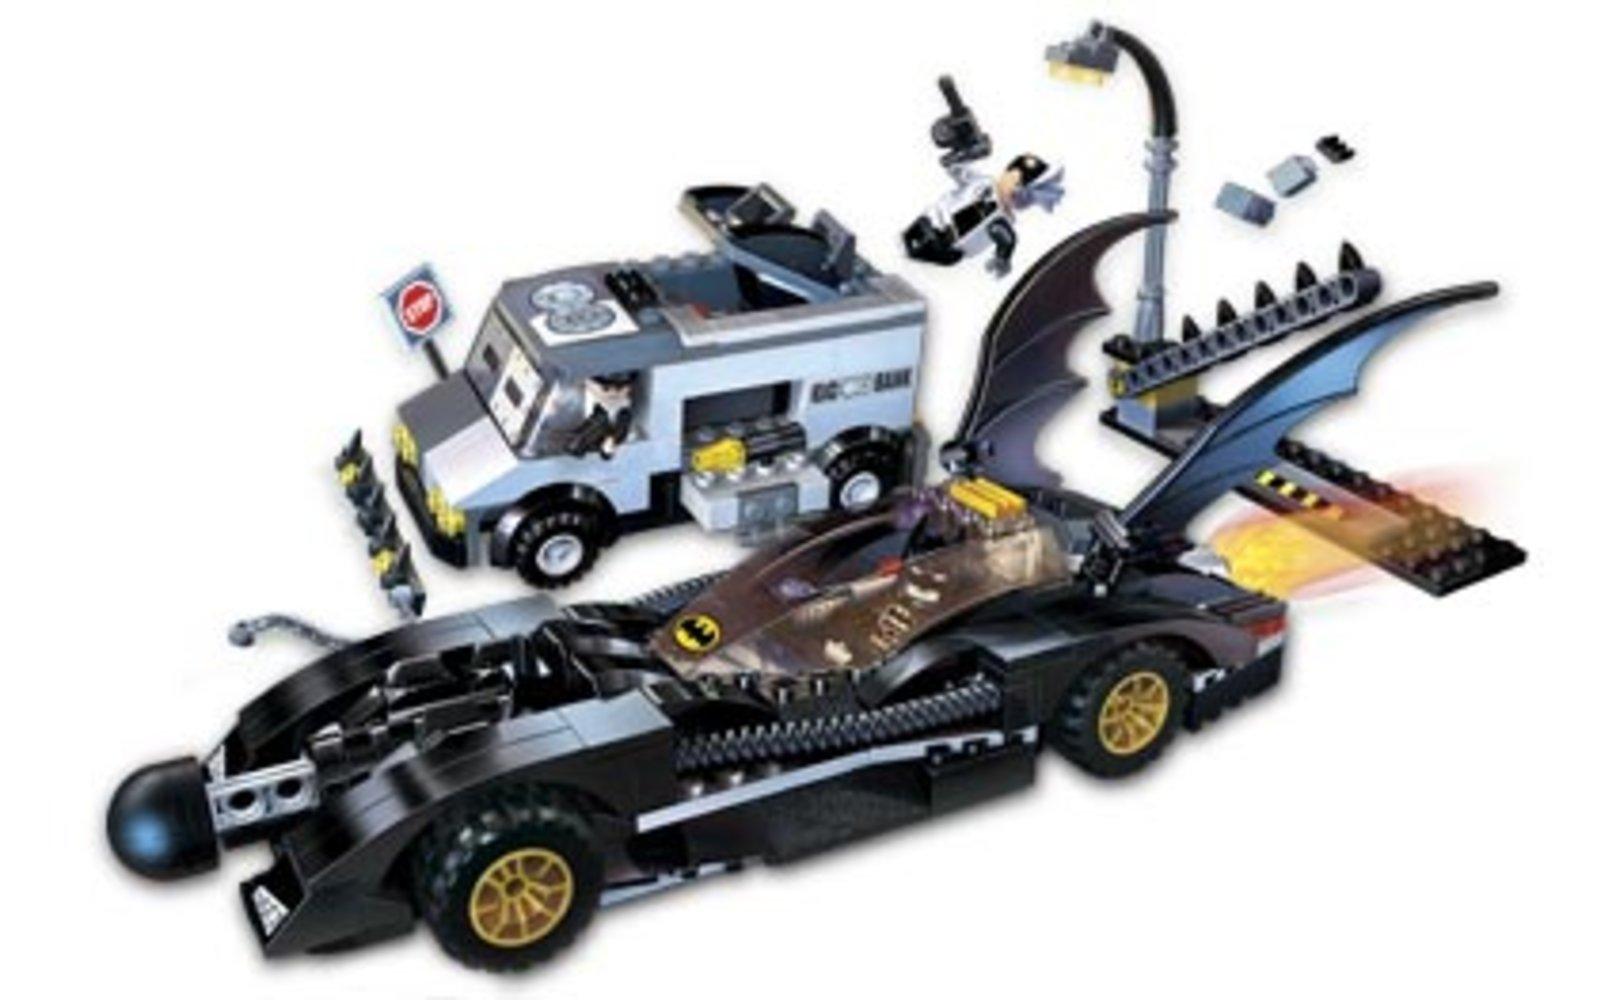 The Batmobile: Two-Face's Escape